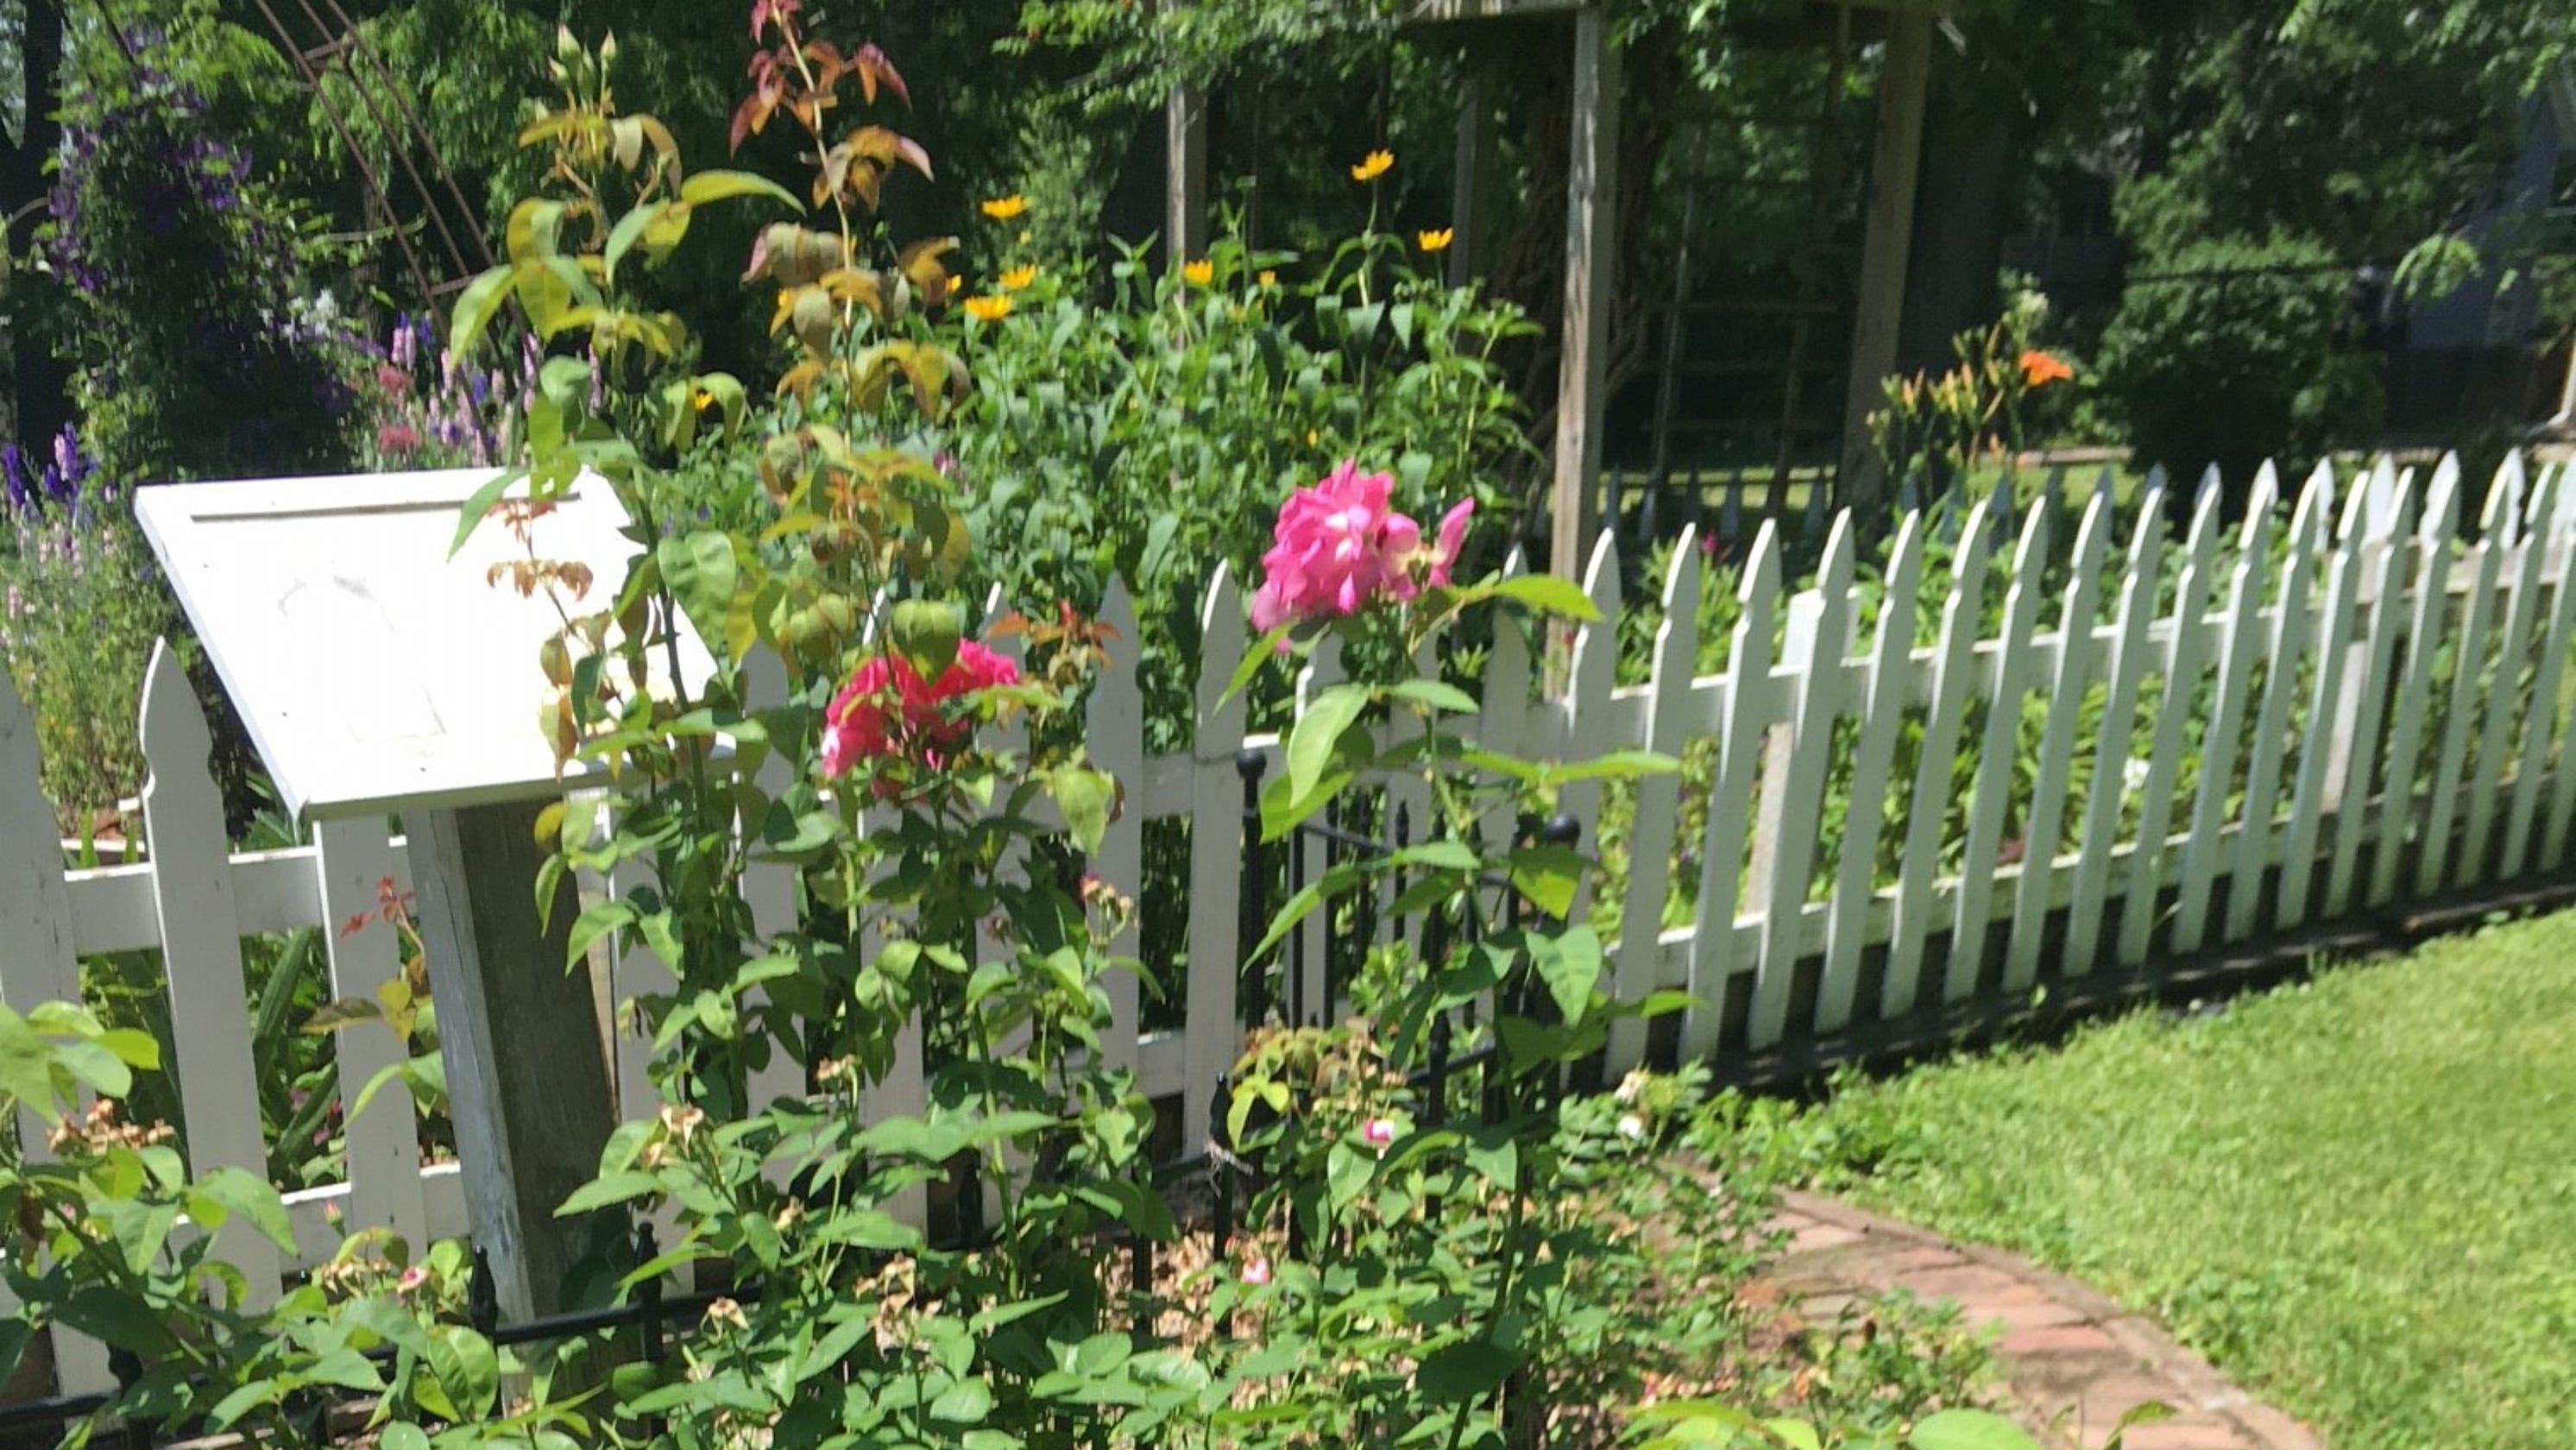 community wide garden tour planned in iowa city